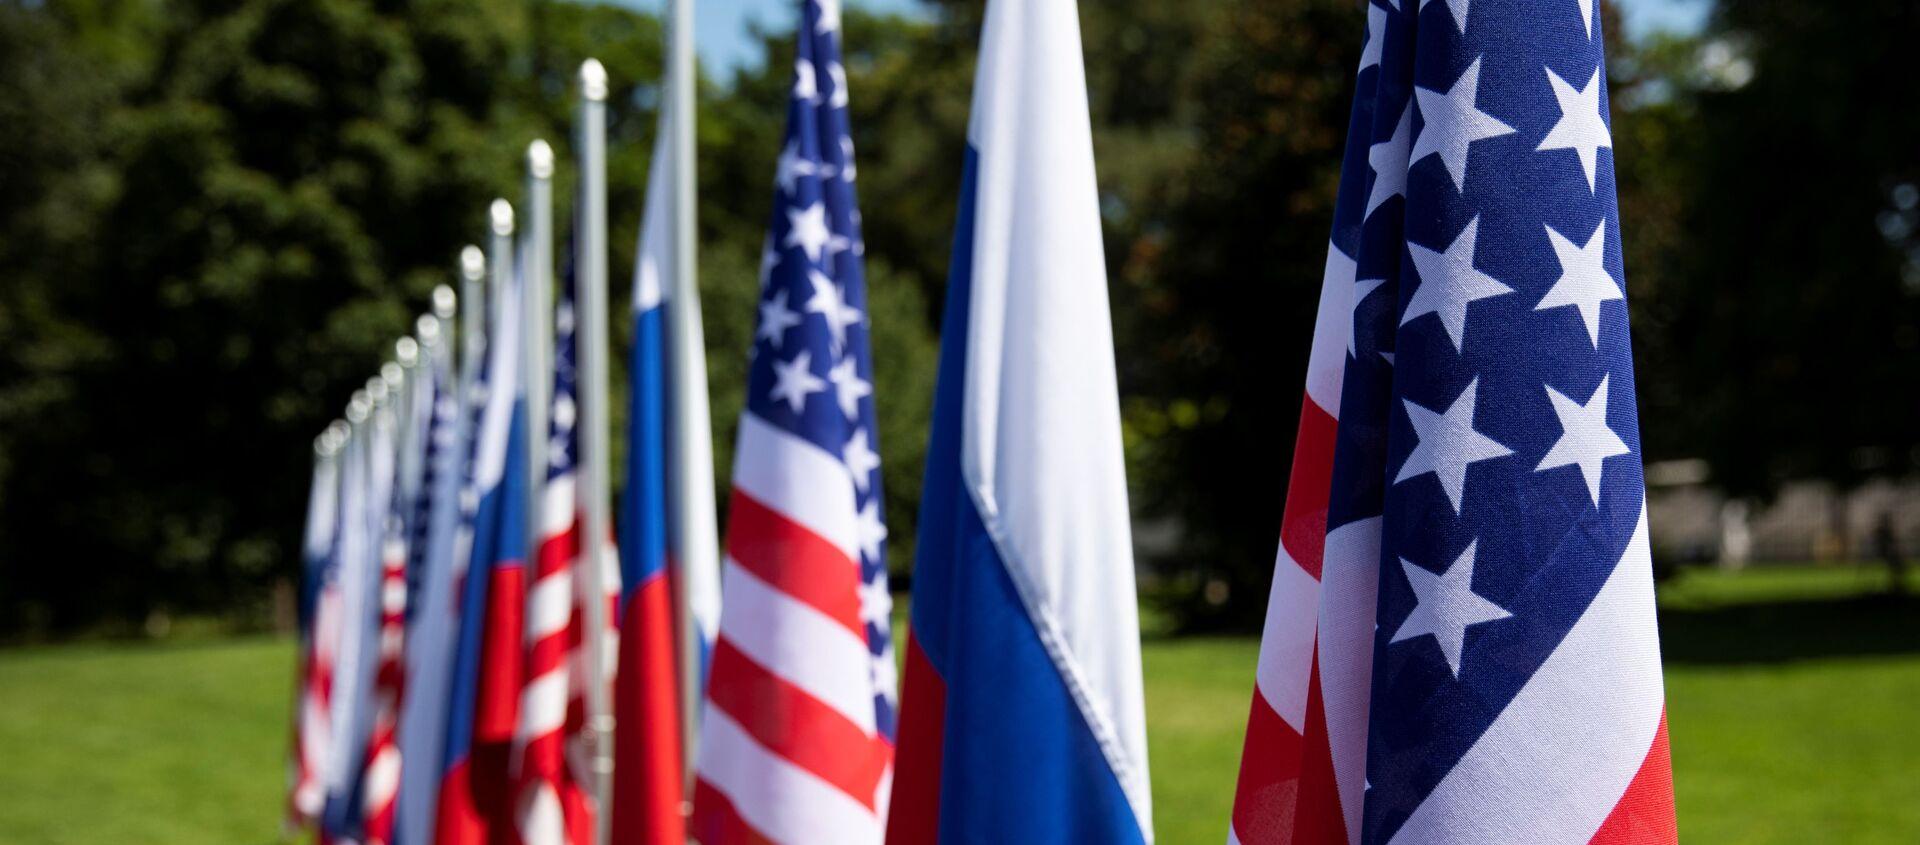 Flags of the U.S., Russia and Switzerland are pictured in the garden in front of villa La Grange, one day prior to the meeting of U.S. President Joe Biden and Russian President Vladimir Putin in Geneva, Switzerland - Sputnik International, 1920, 20.06.2021